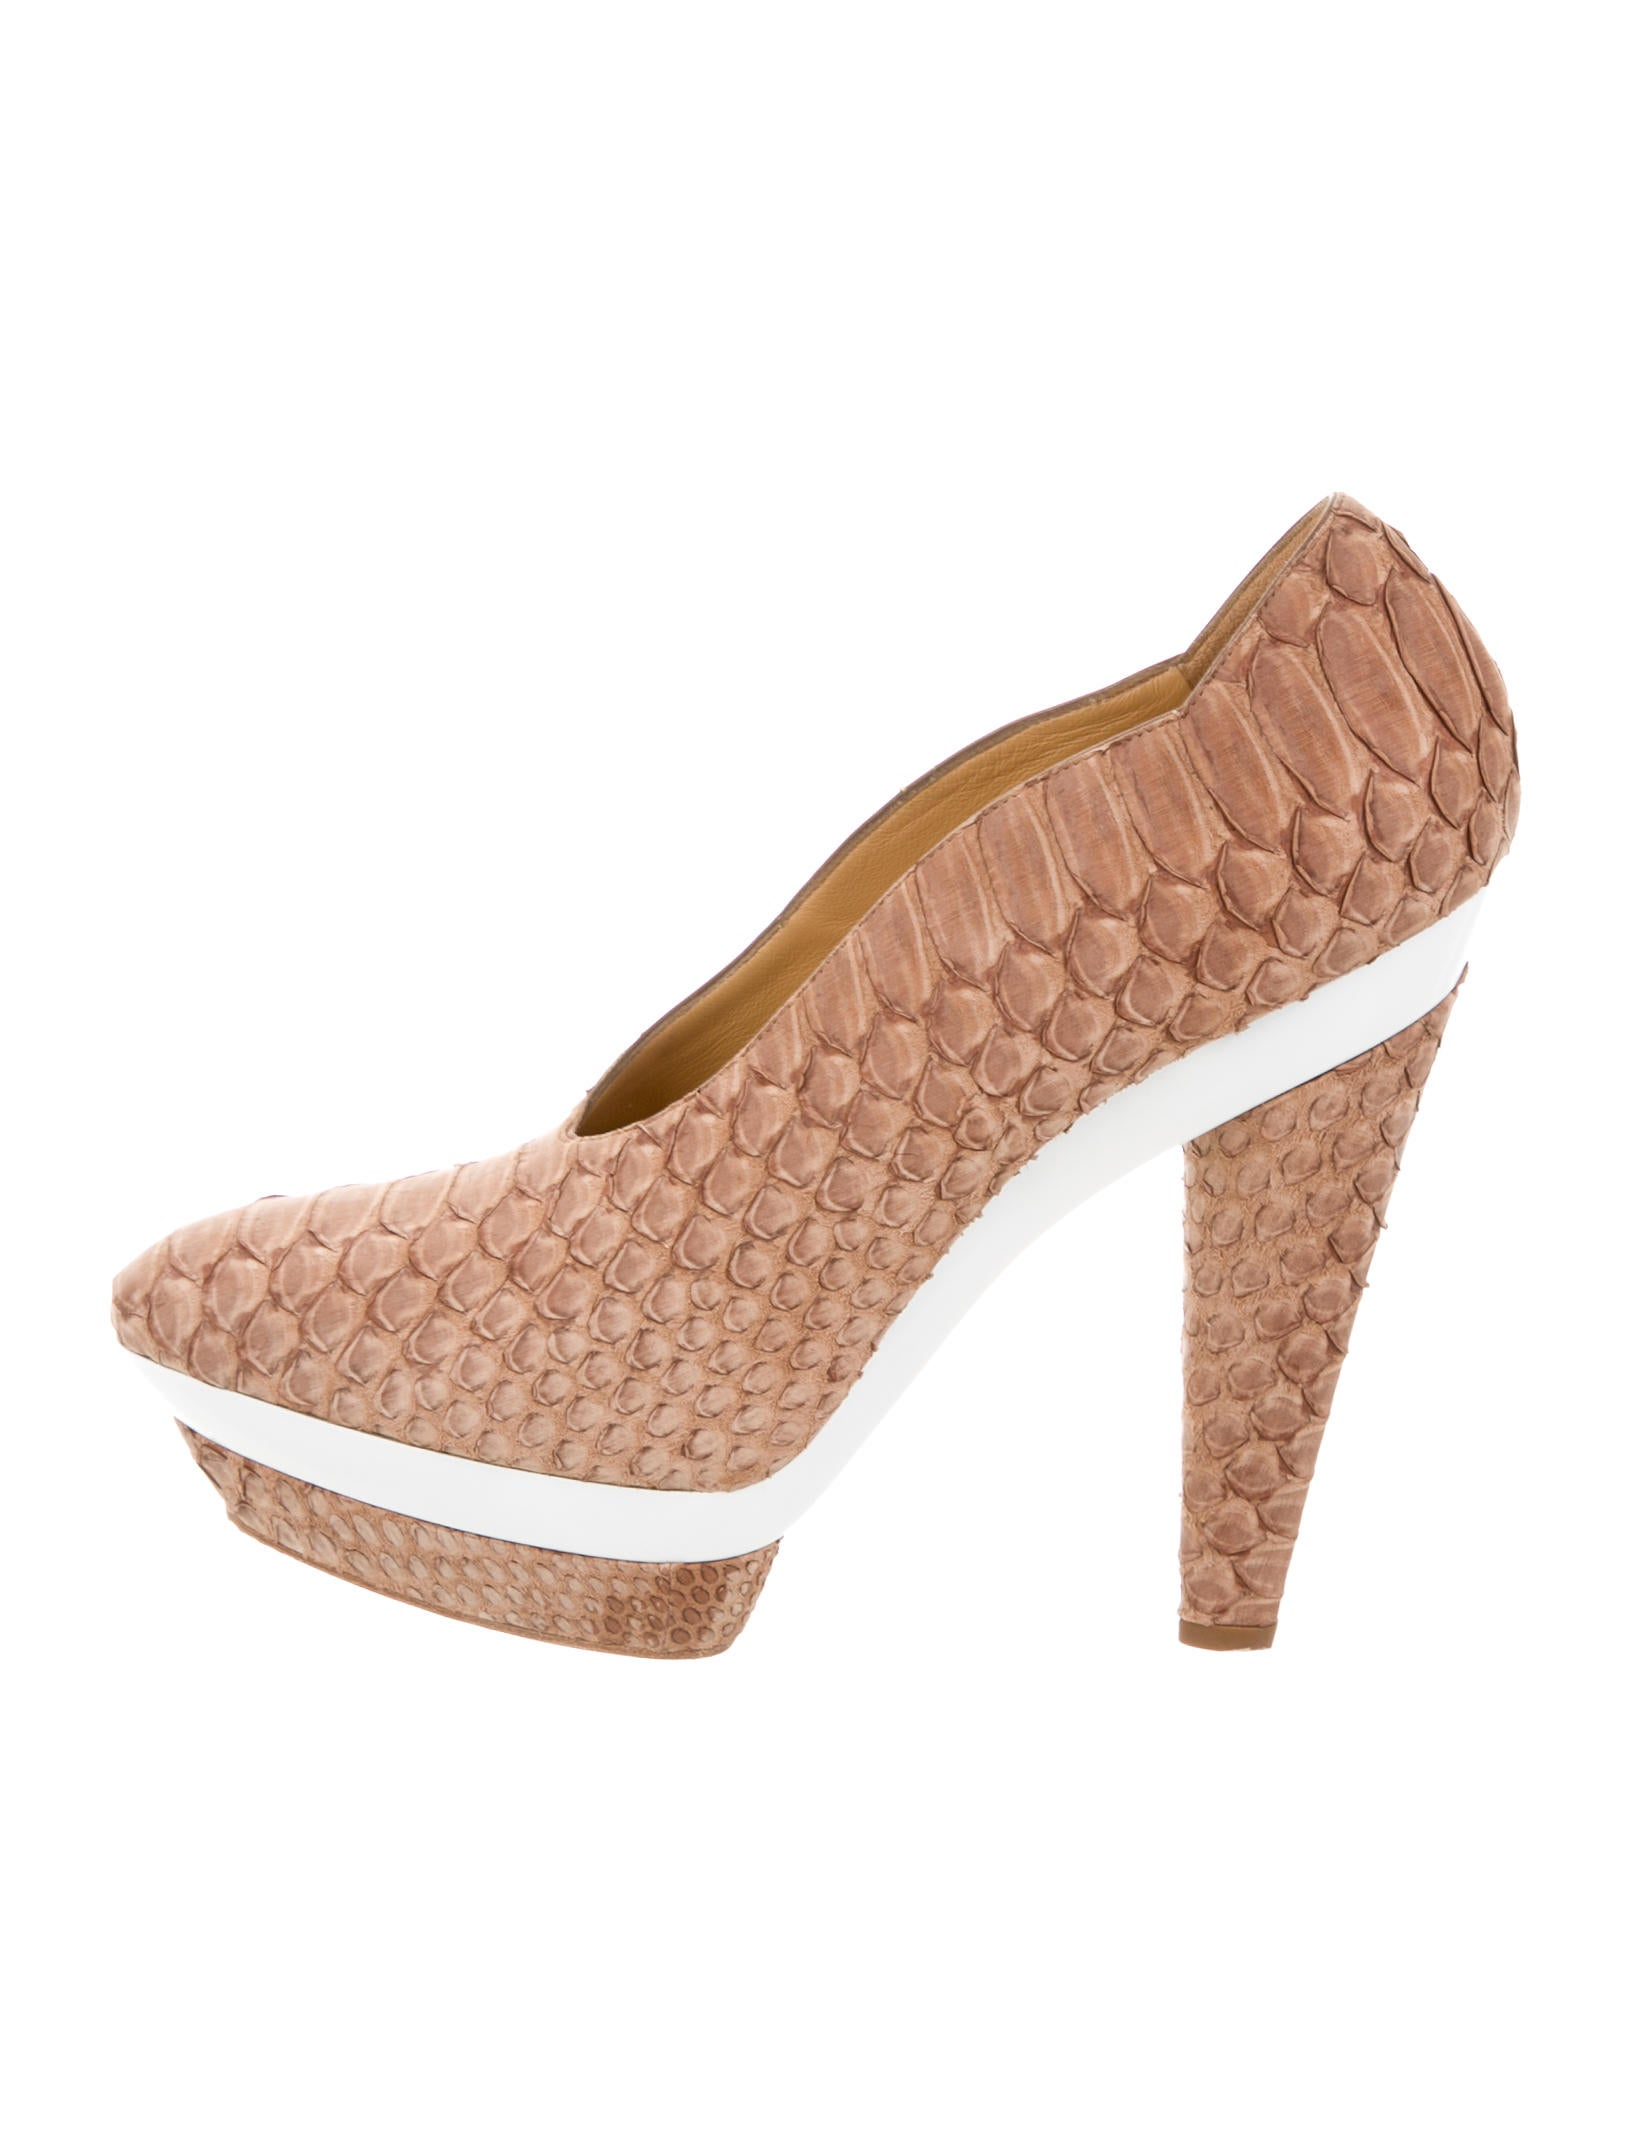 Devi Kroell Python Platform Pumps cheap sale fashion Style sale choice wTYucBiDu